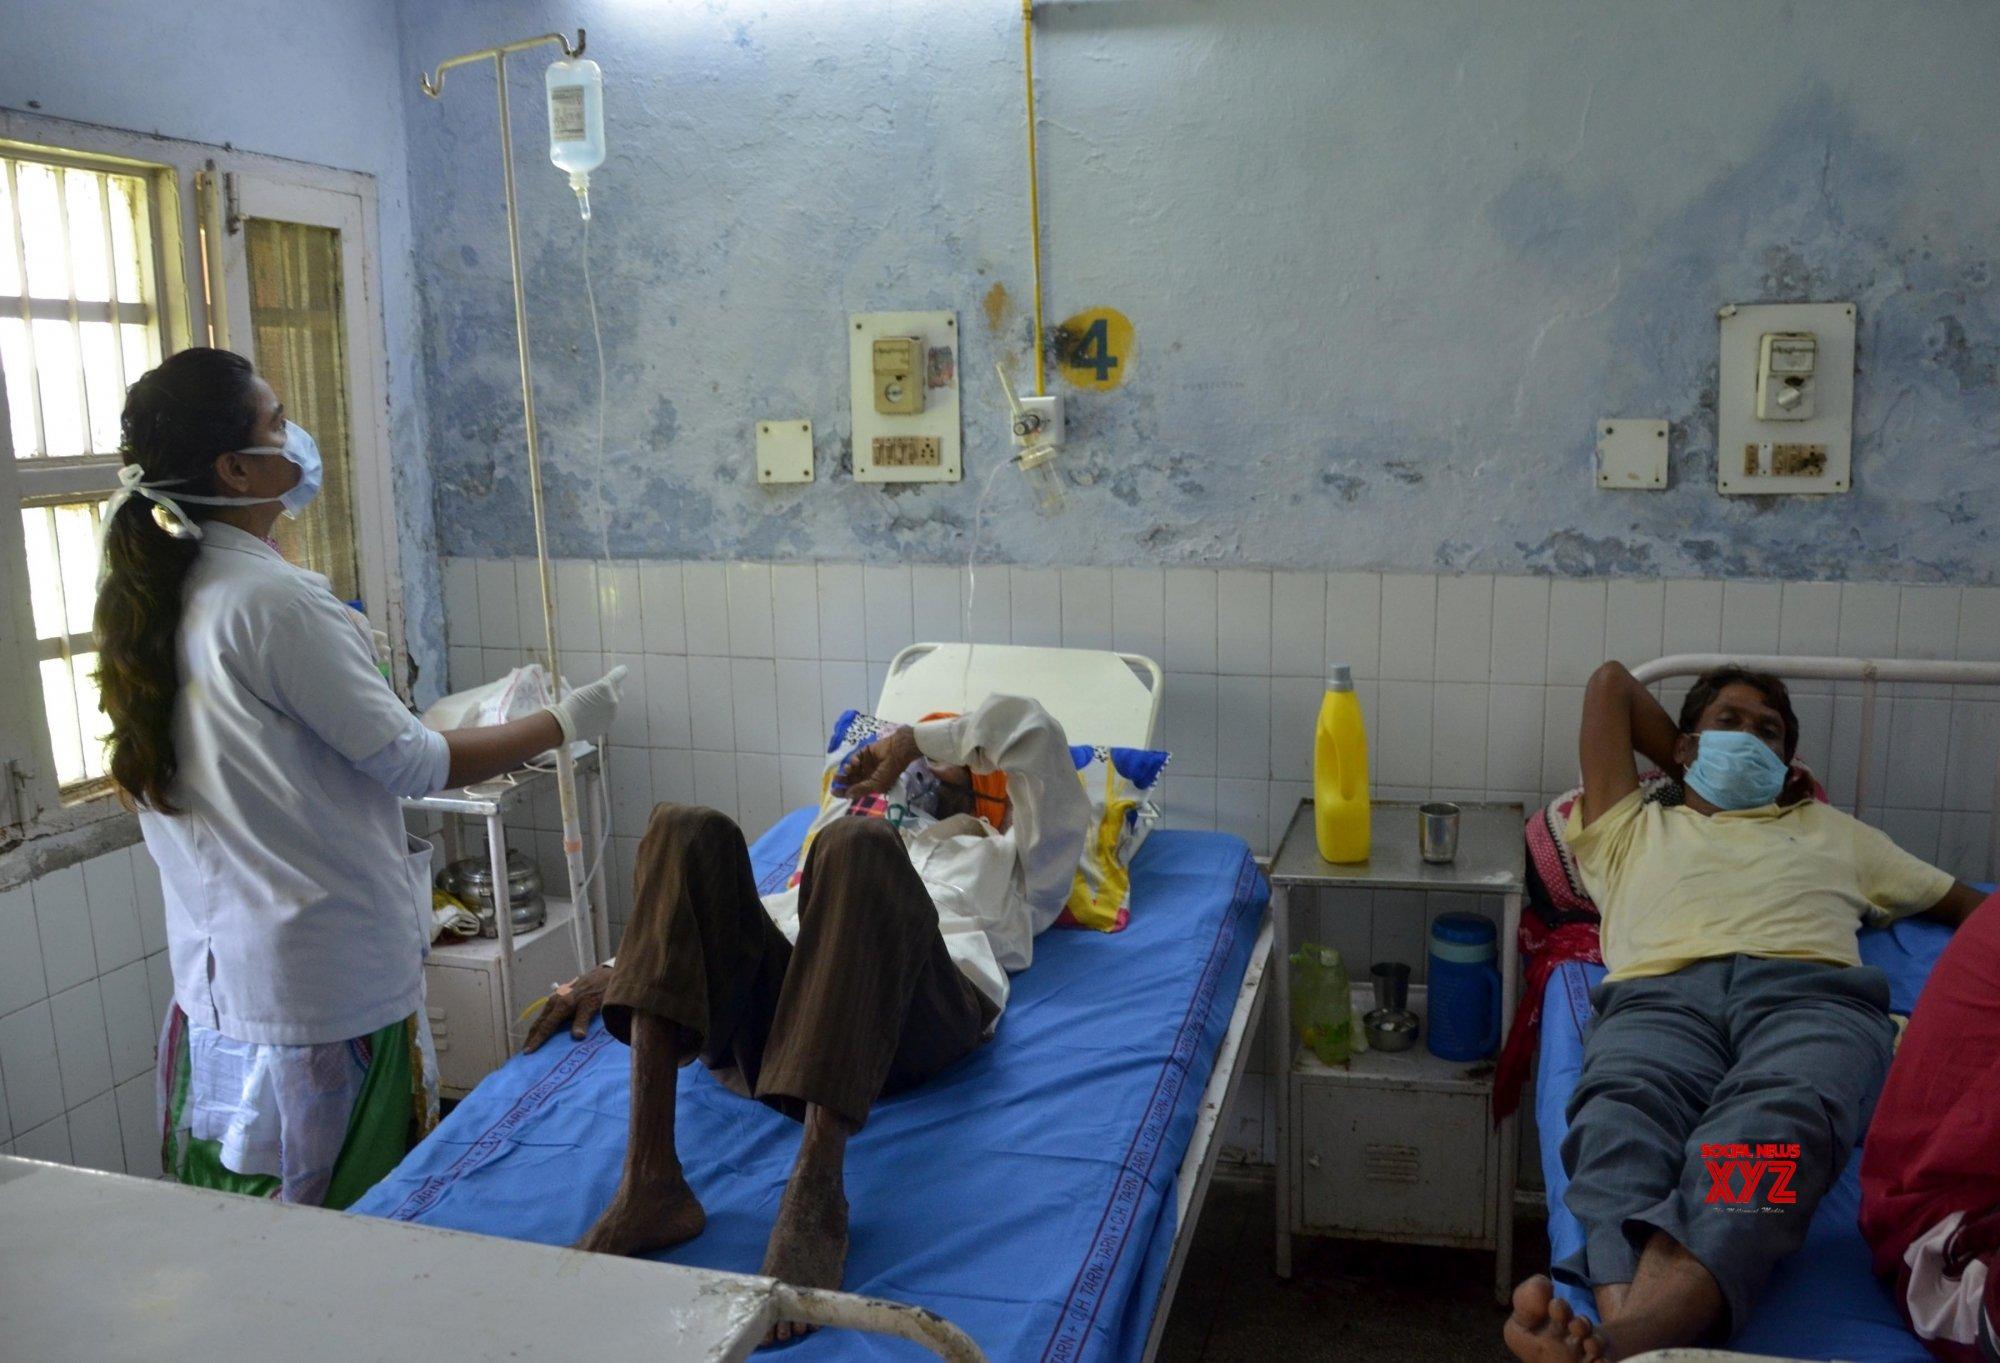 Amritsar: Hooch tragedy: People who were taken ill receive treatment #Gallery